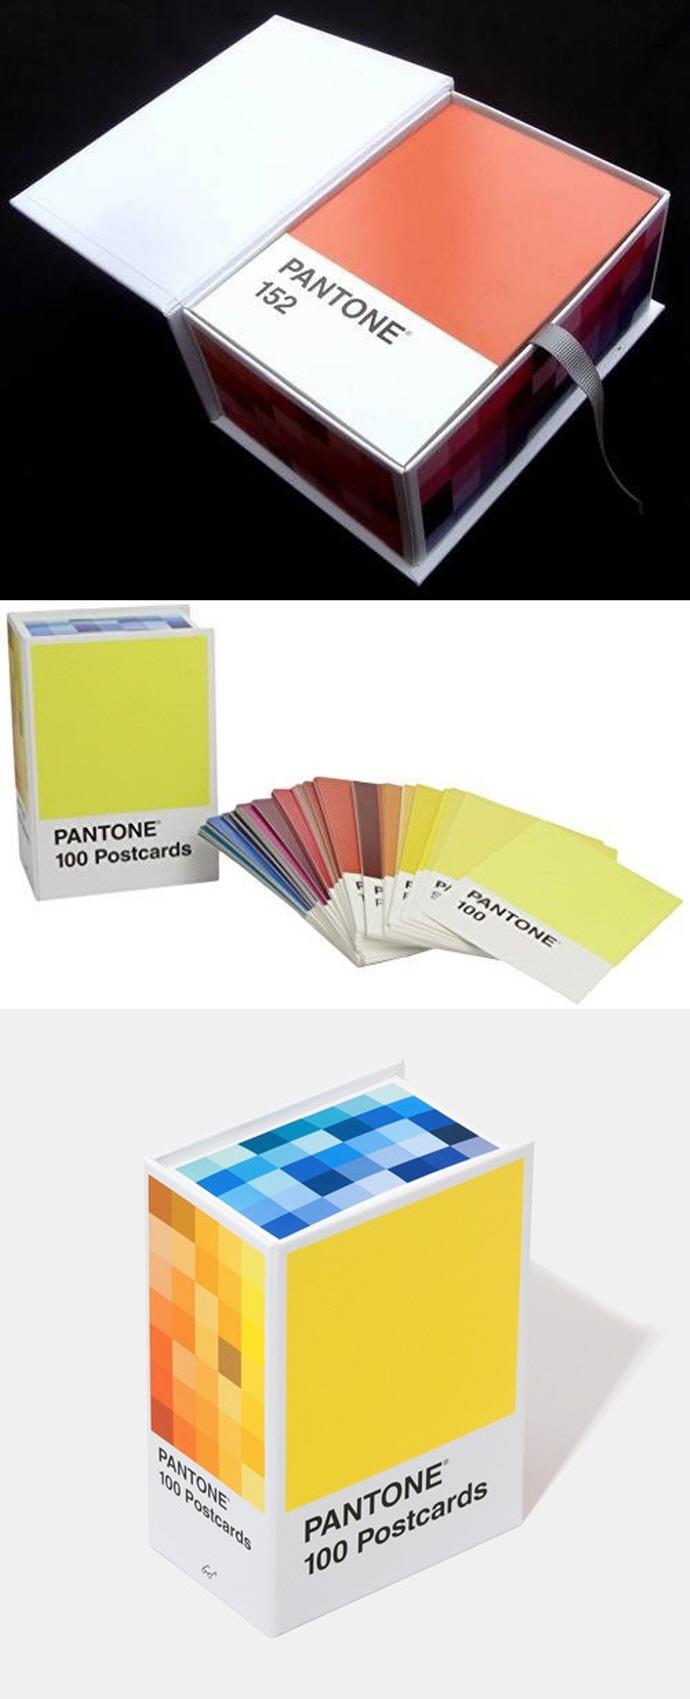 Pantone Postcard Box (팬톤 엽서 박스) 도서 상세이미지